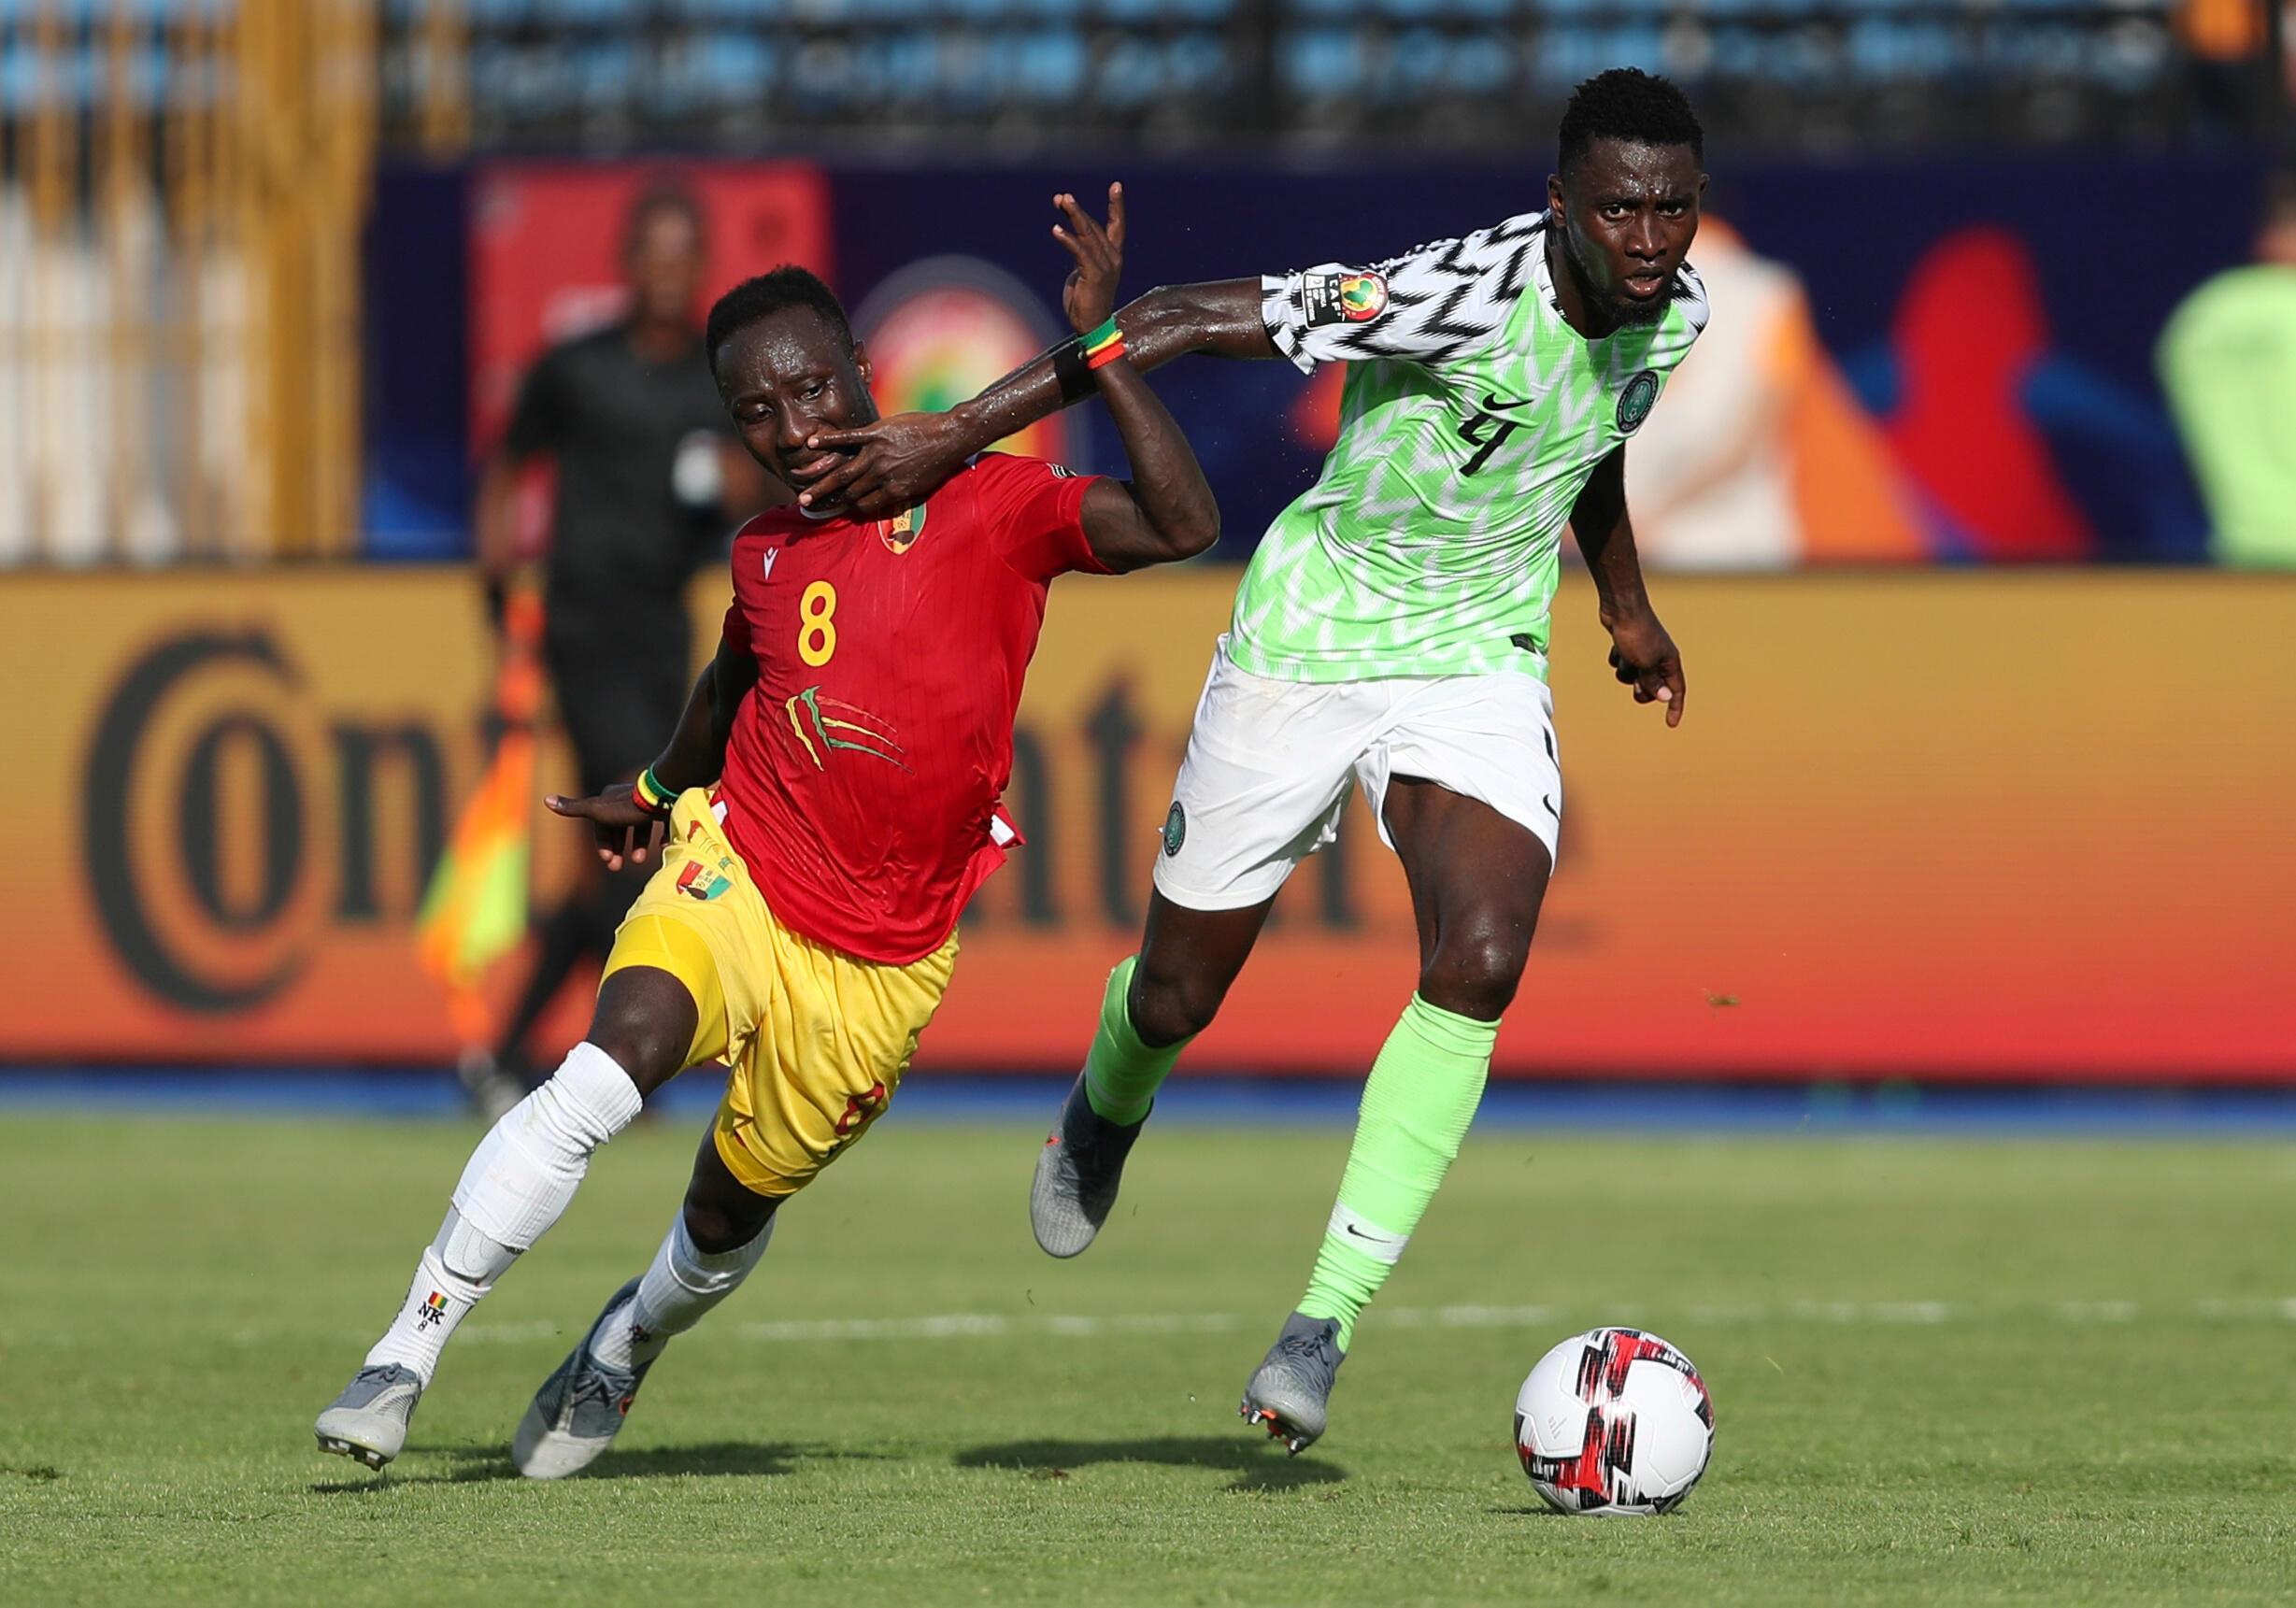 Le Nigérian Wilfred Ndidi face au Guinéen Naby Keita, lors de la CAN 2019.